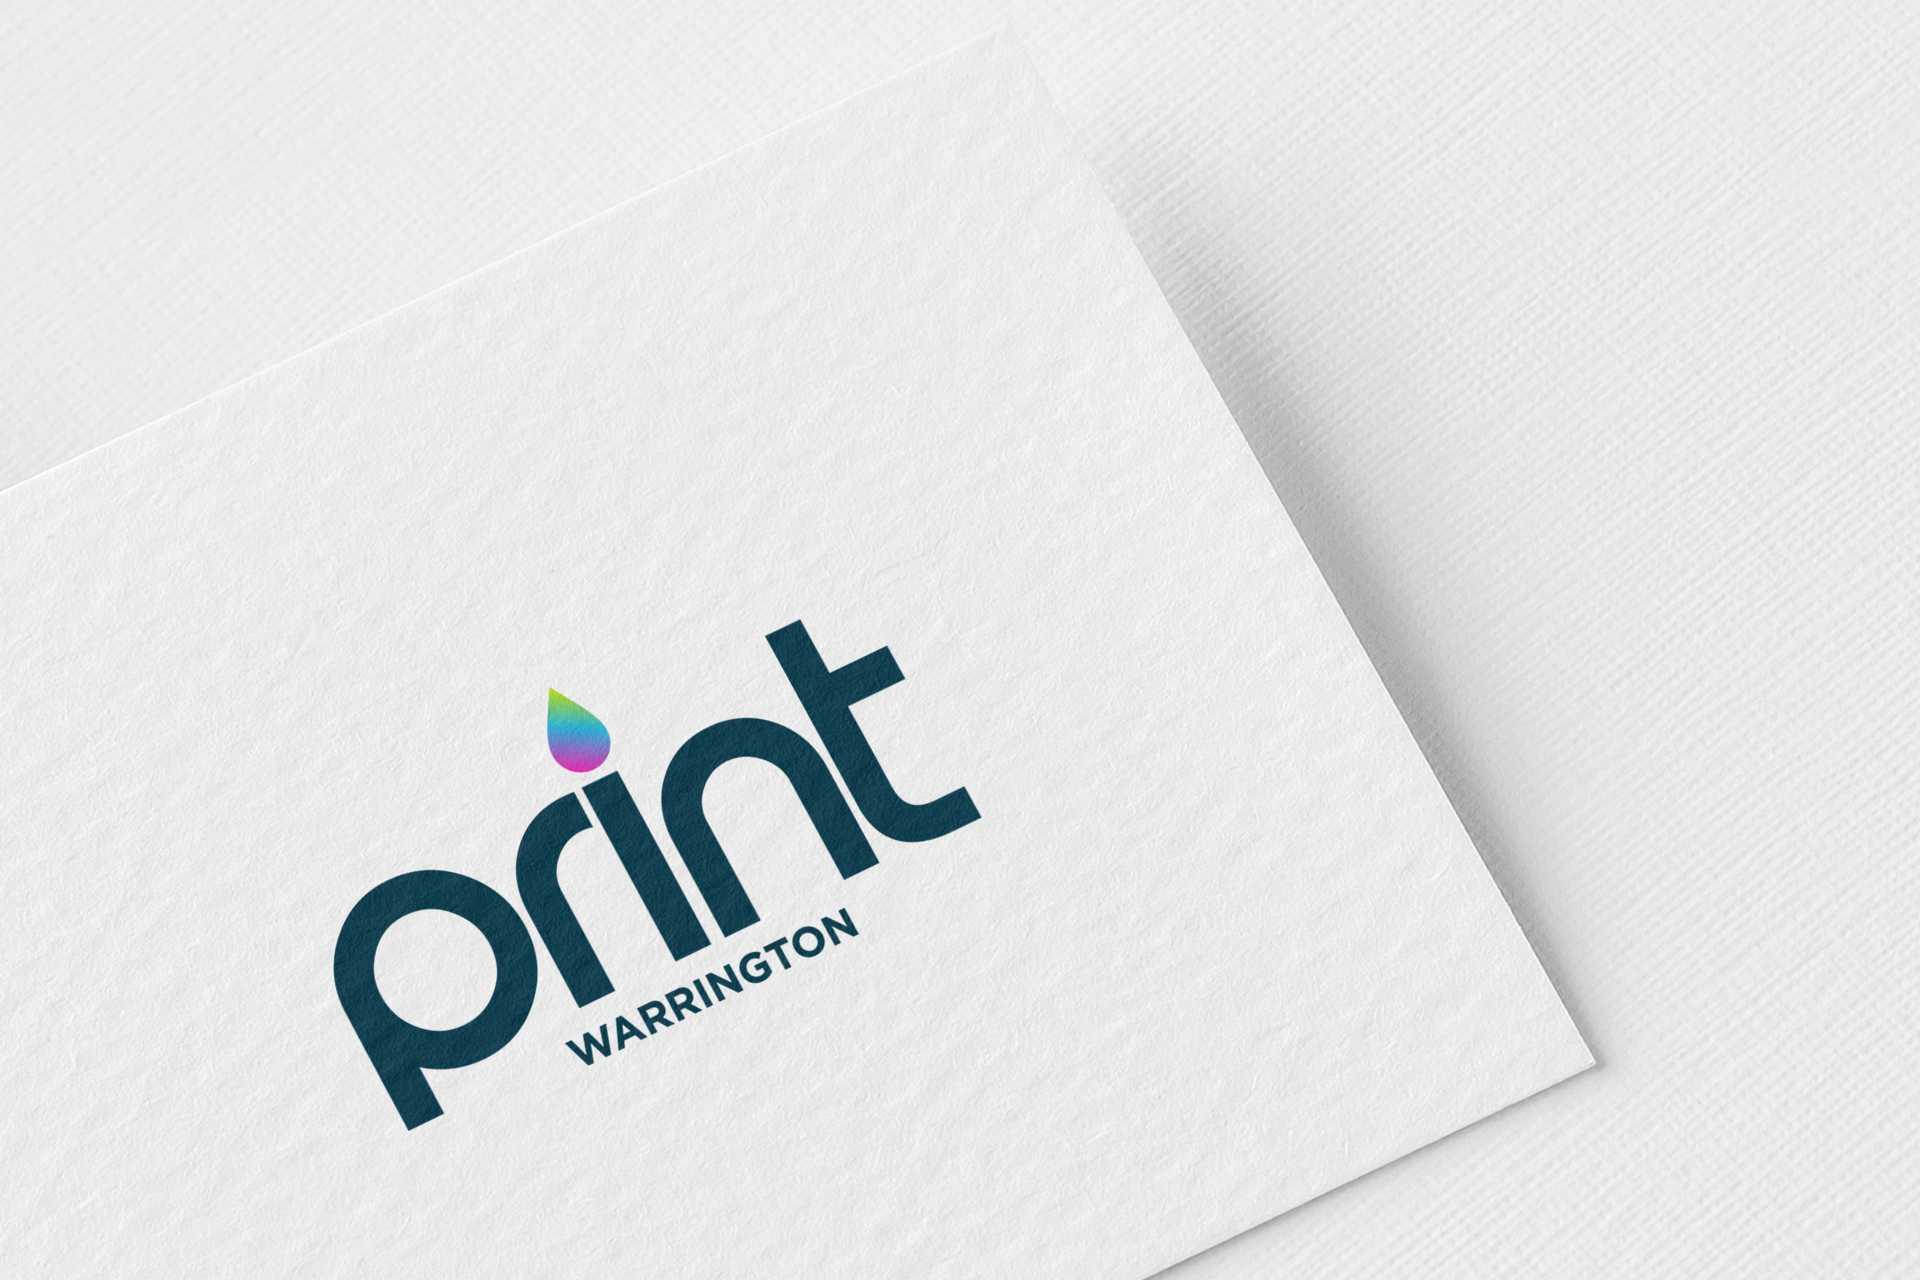 pixel-perfect-warrington-print-warrington-logo-design